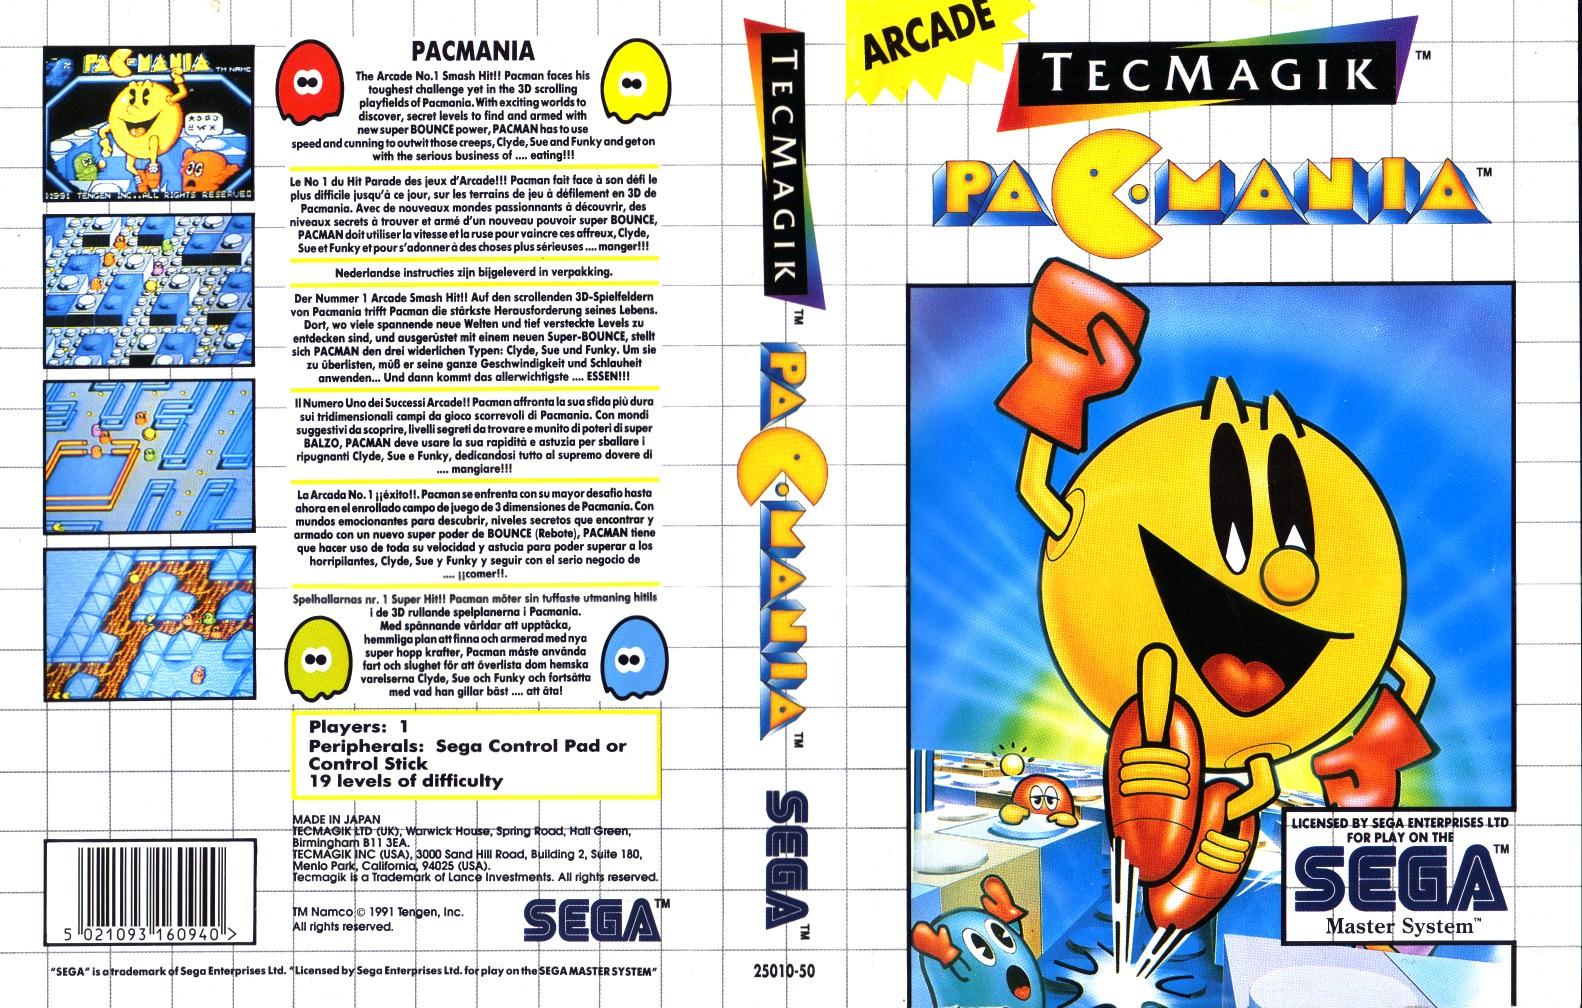 http://www.smspower.org/uploads/Scans/PacMania-SMS-EU.jpg